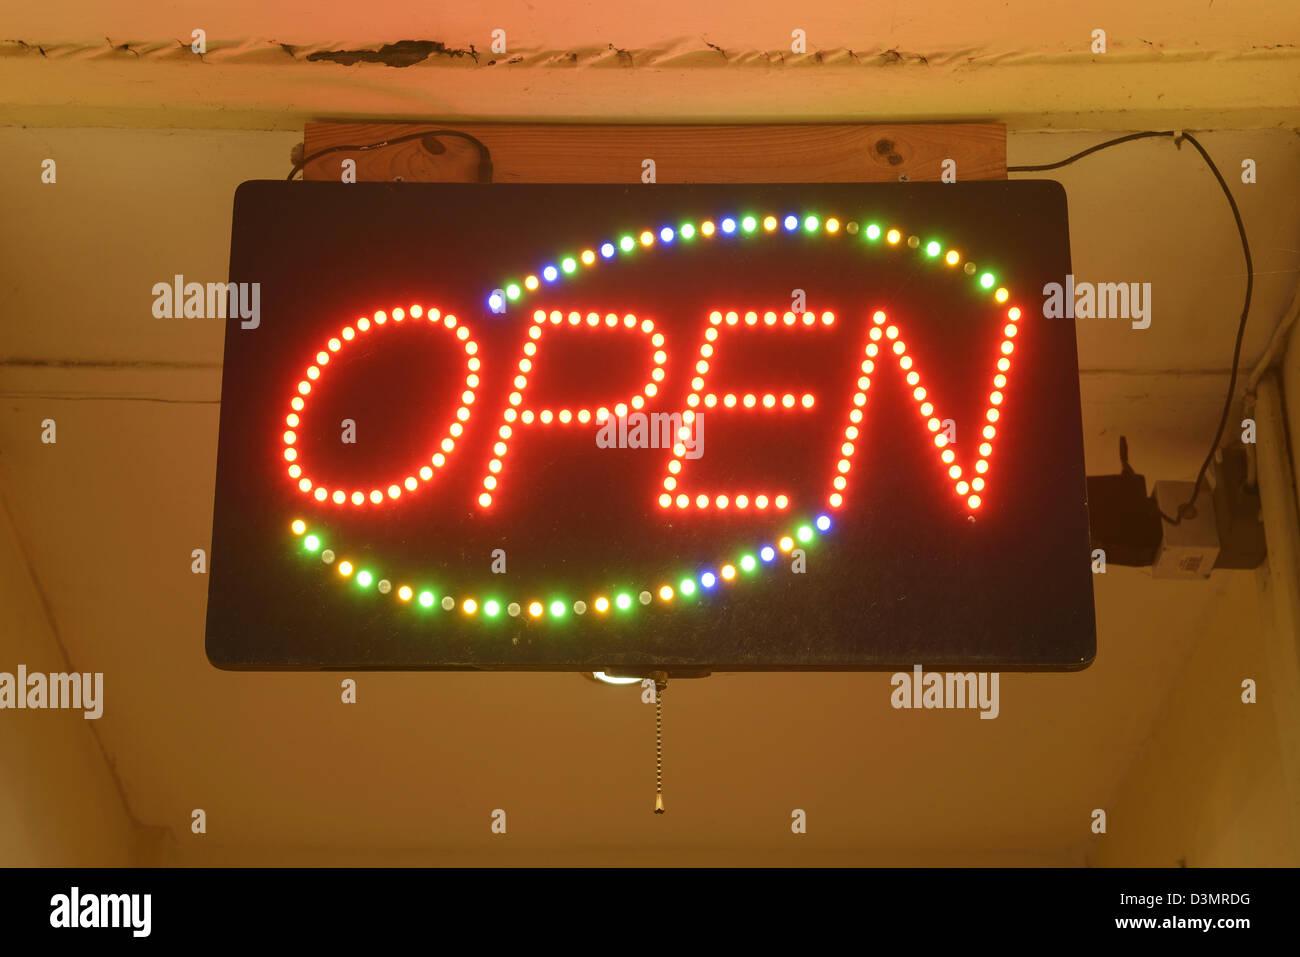 LED Open sign - Stock Image